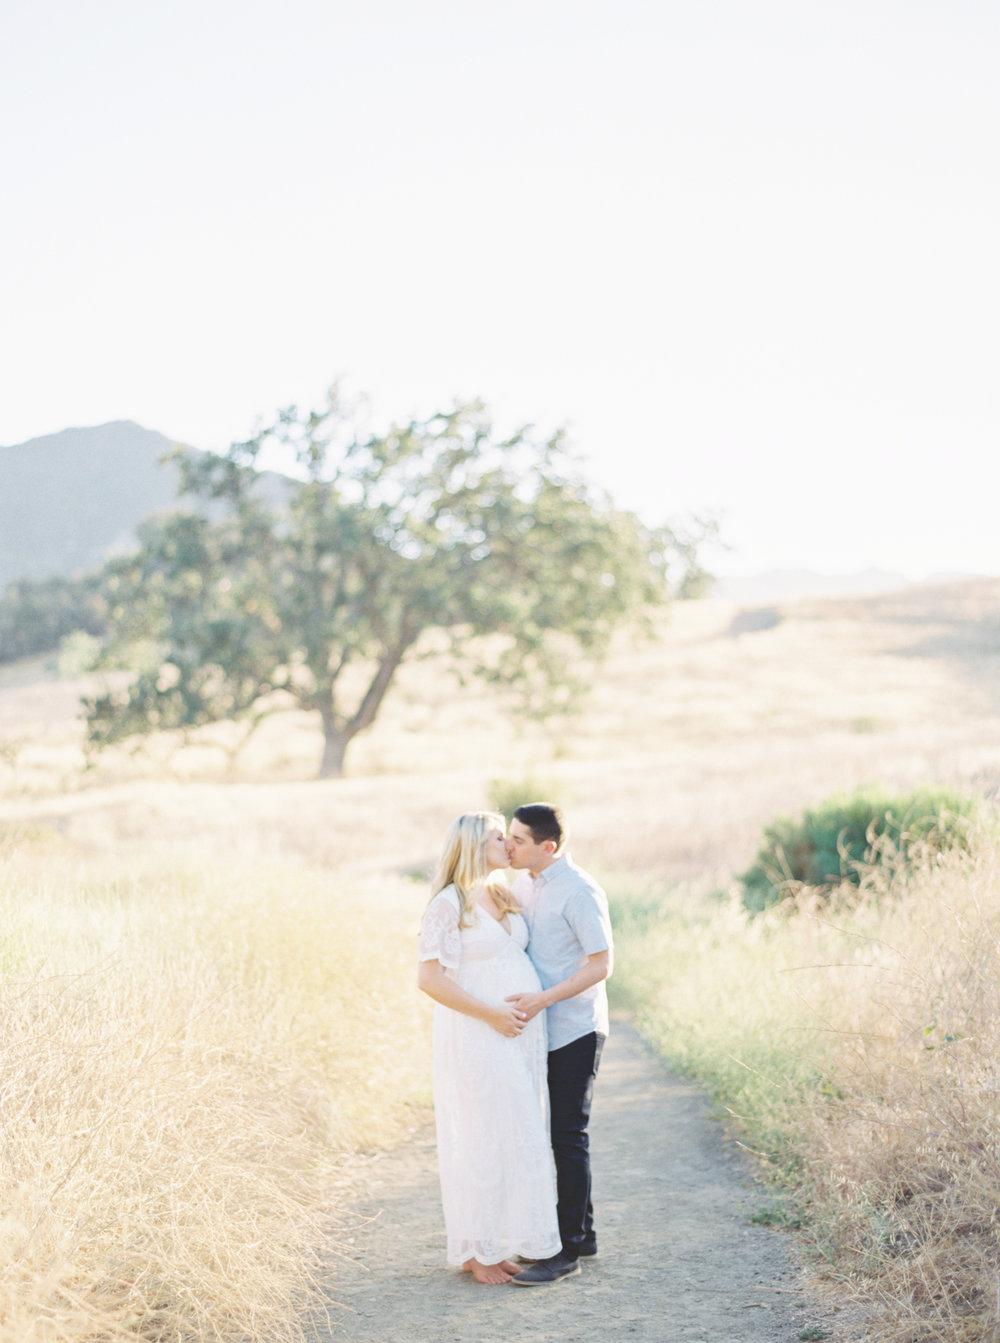 Rachel Owens Photography - Malibu Creek - Film Photography-14.jpg